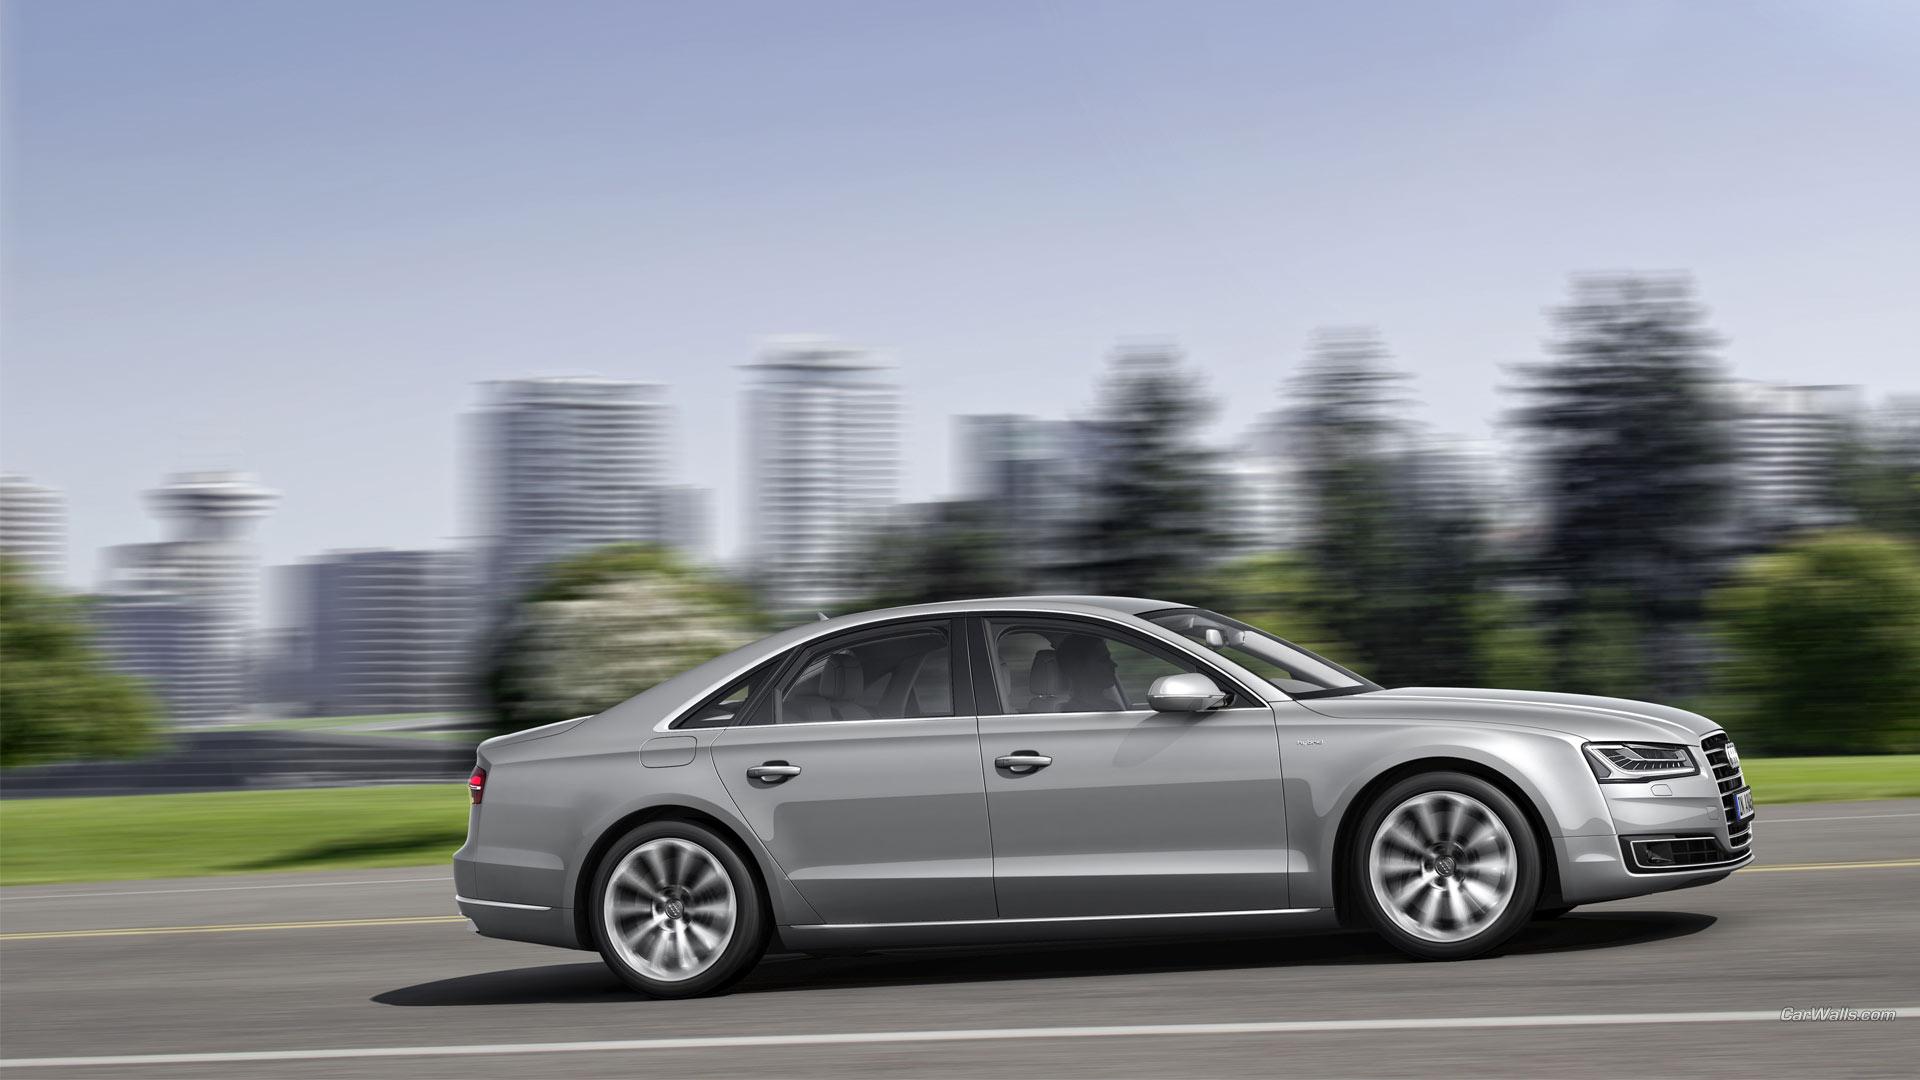 Cool Hd Audi Wallpaper Free Downloads For